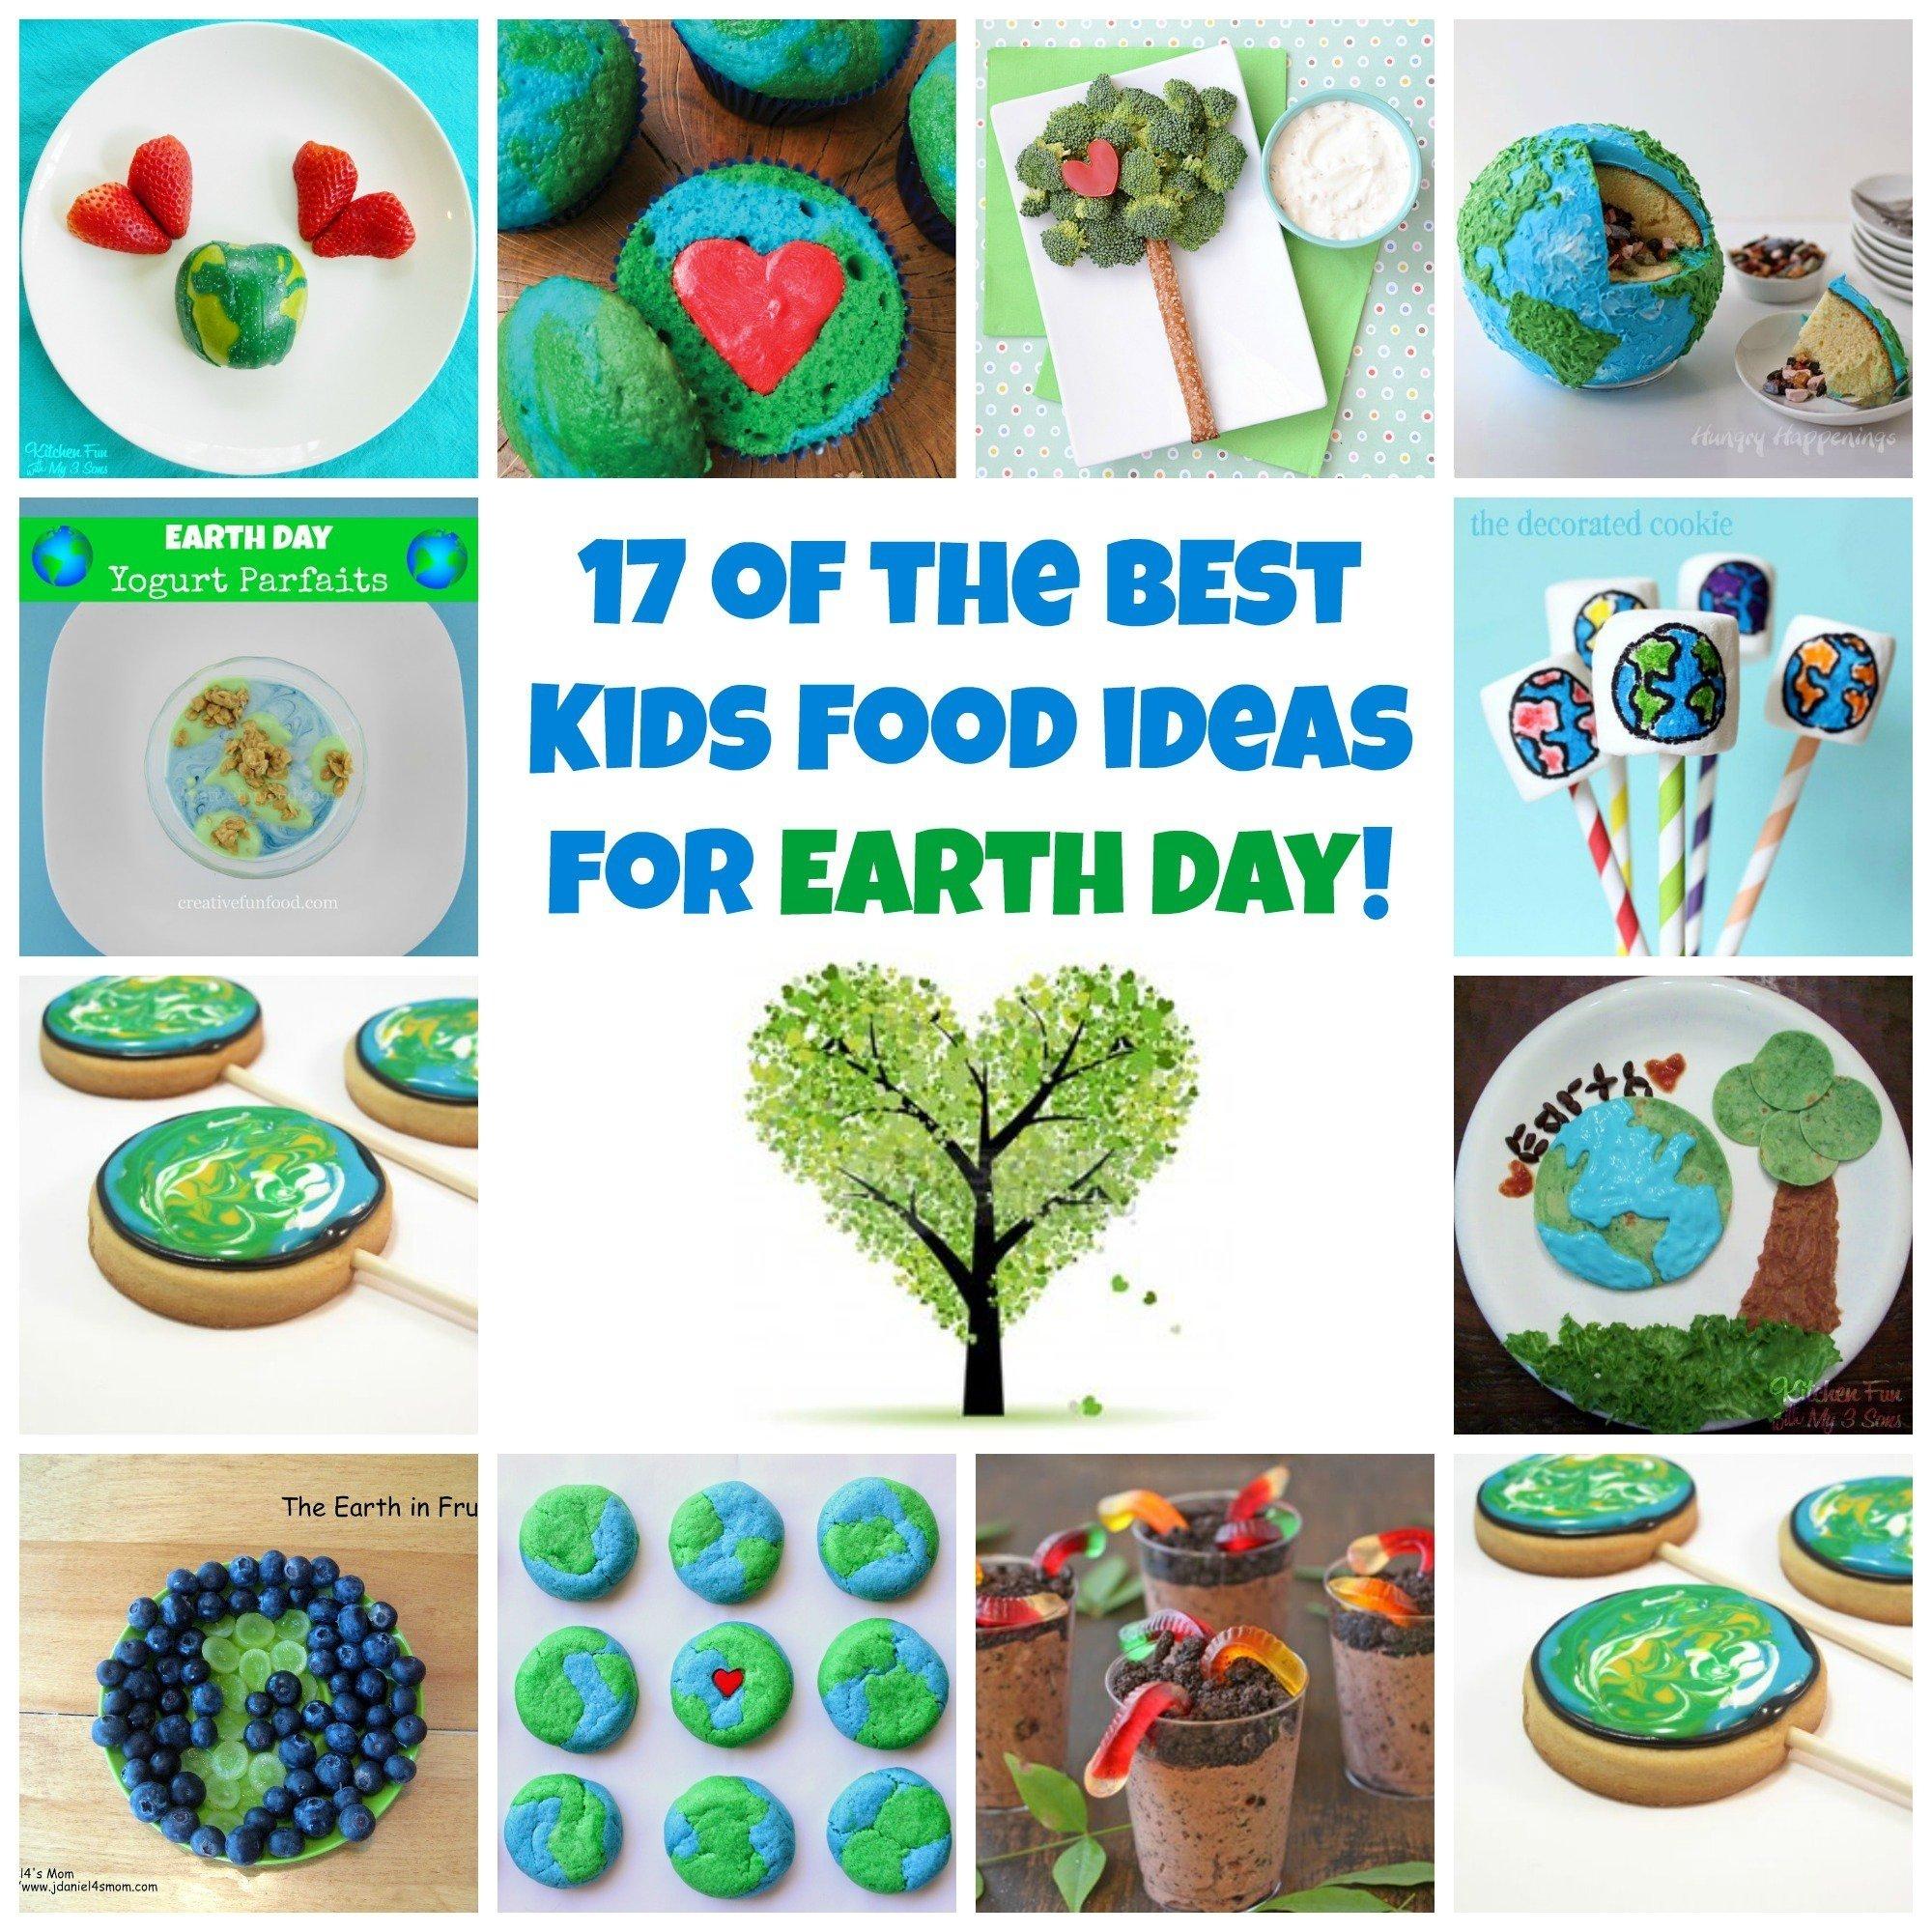 17 of the best earth day fun food & recipe ideas for kids   fun food